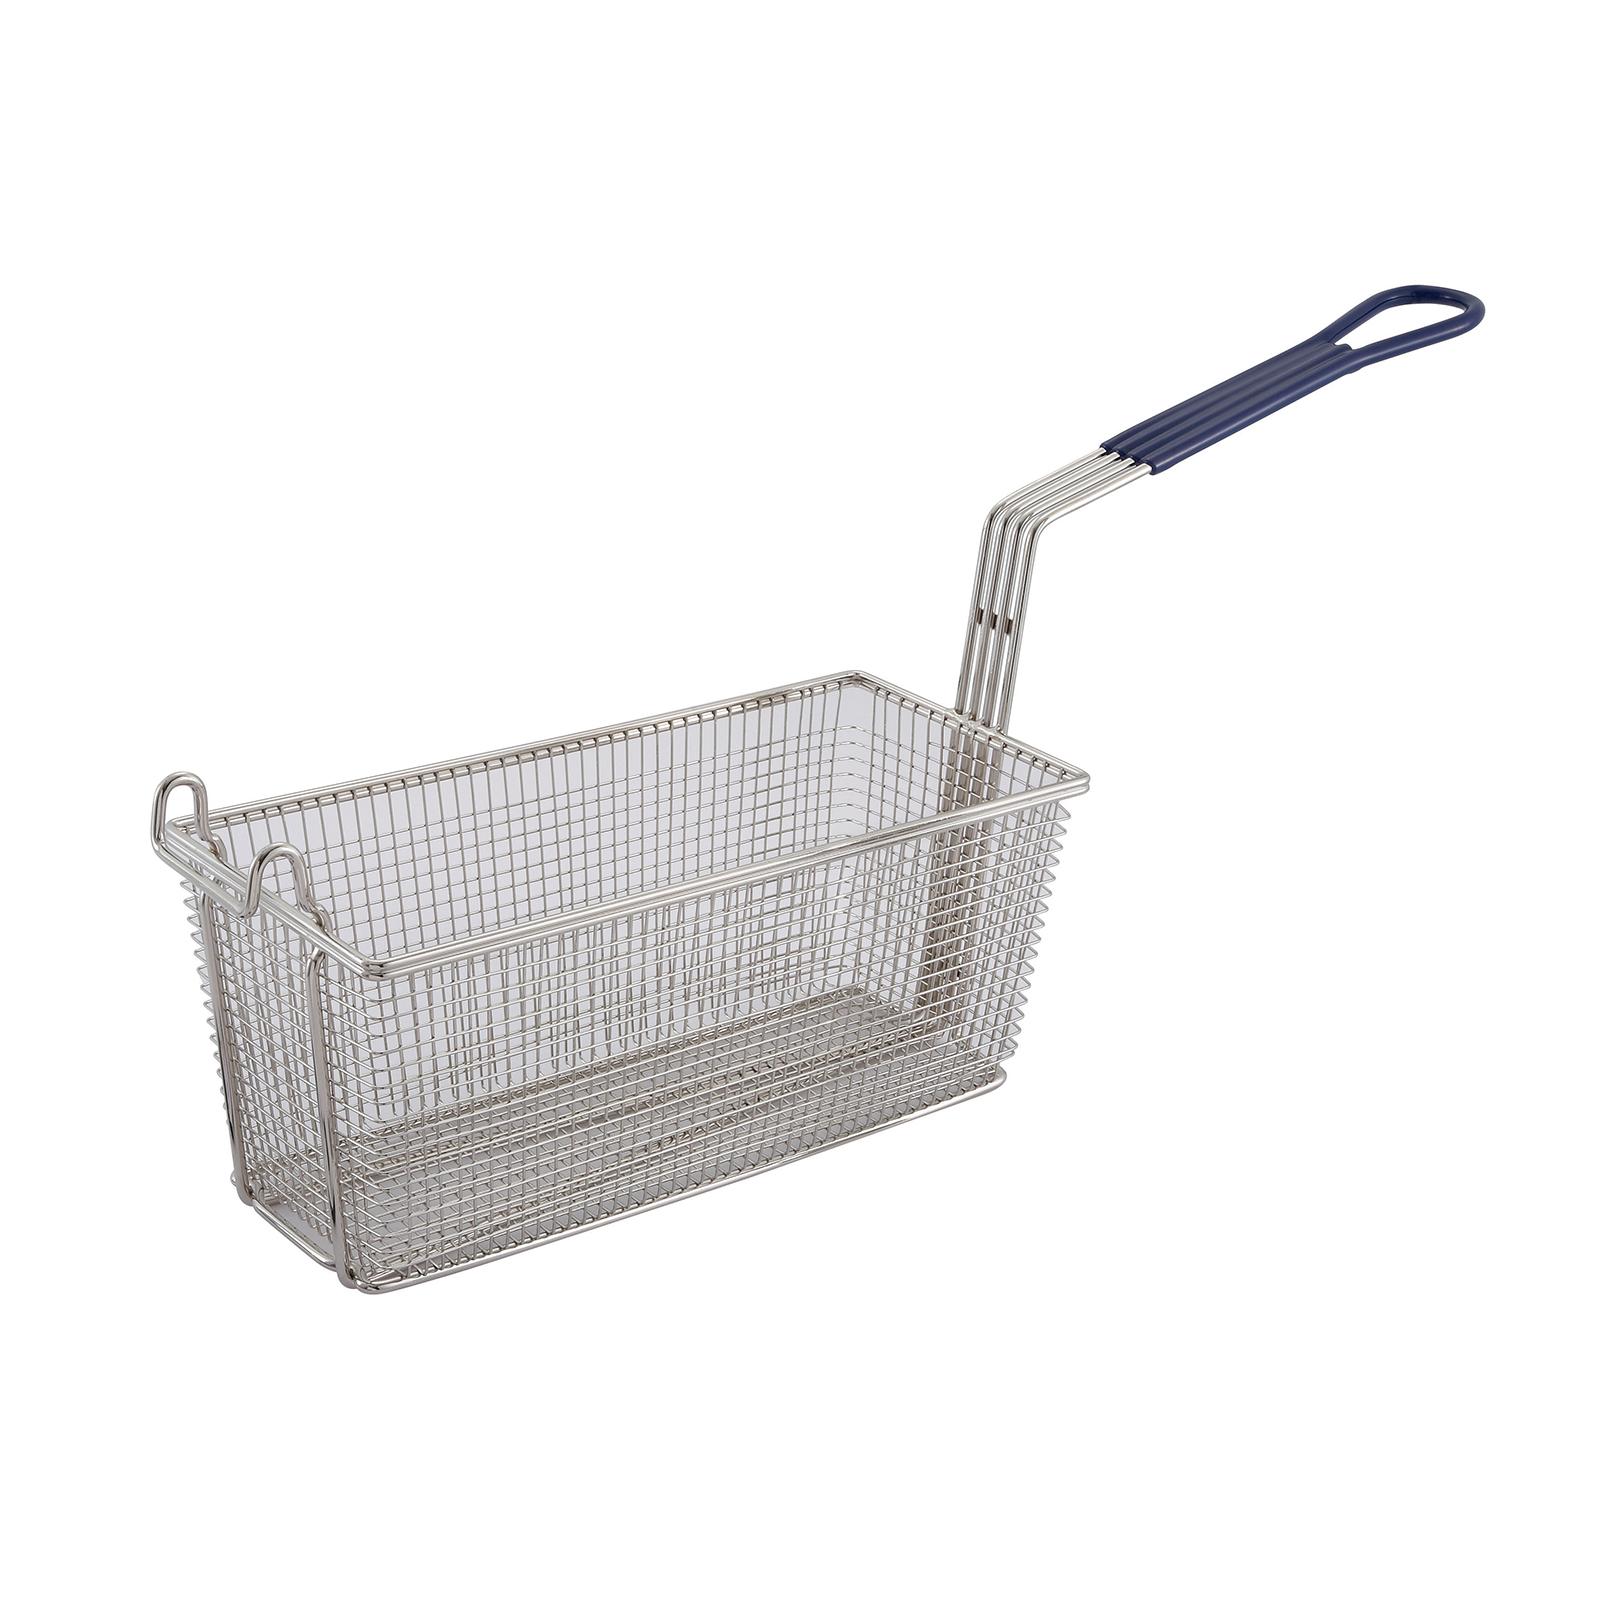 1600-23 Winco FB-20 fryer basket